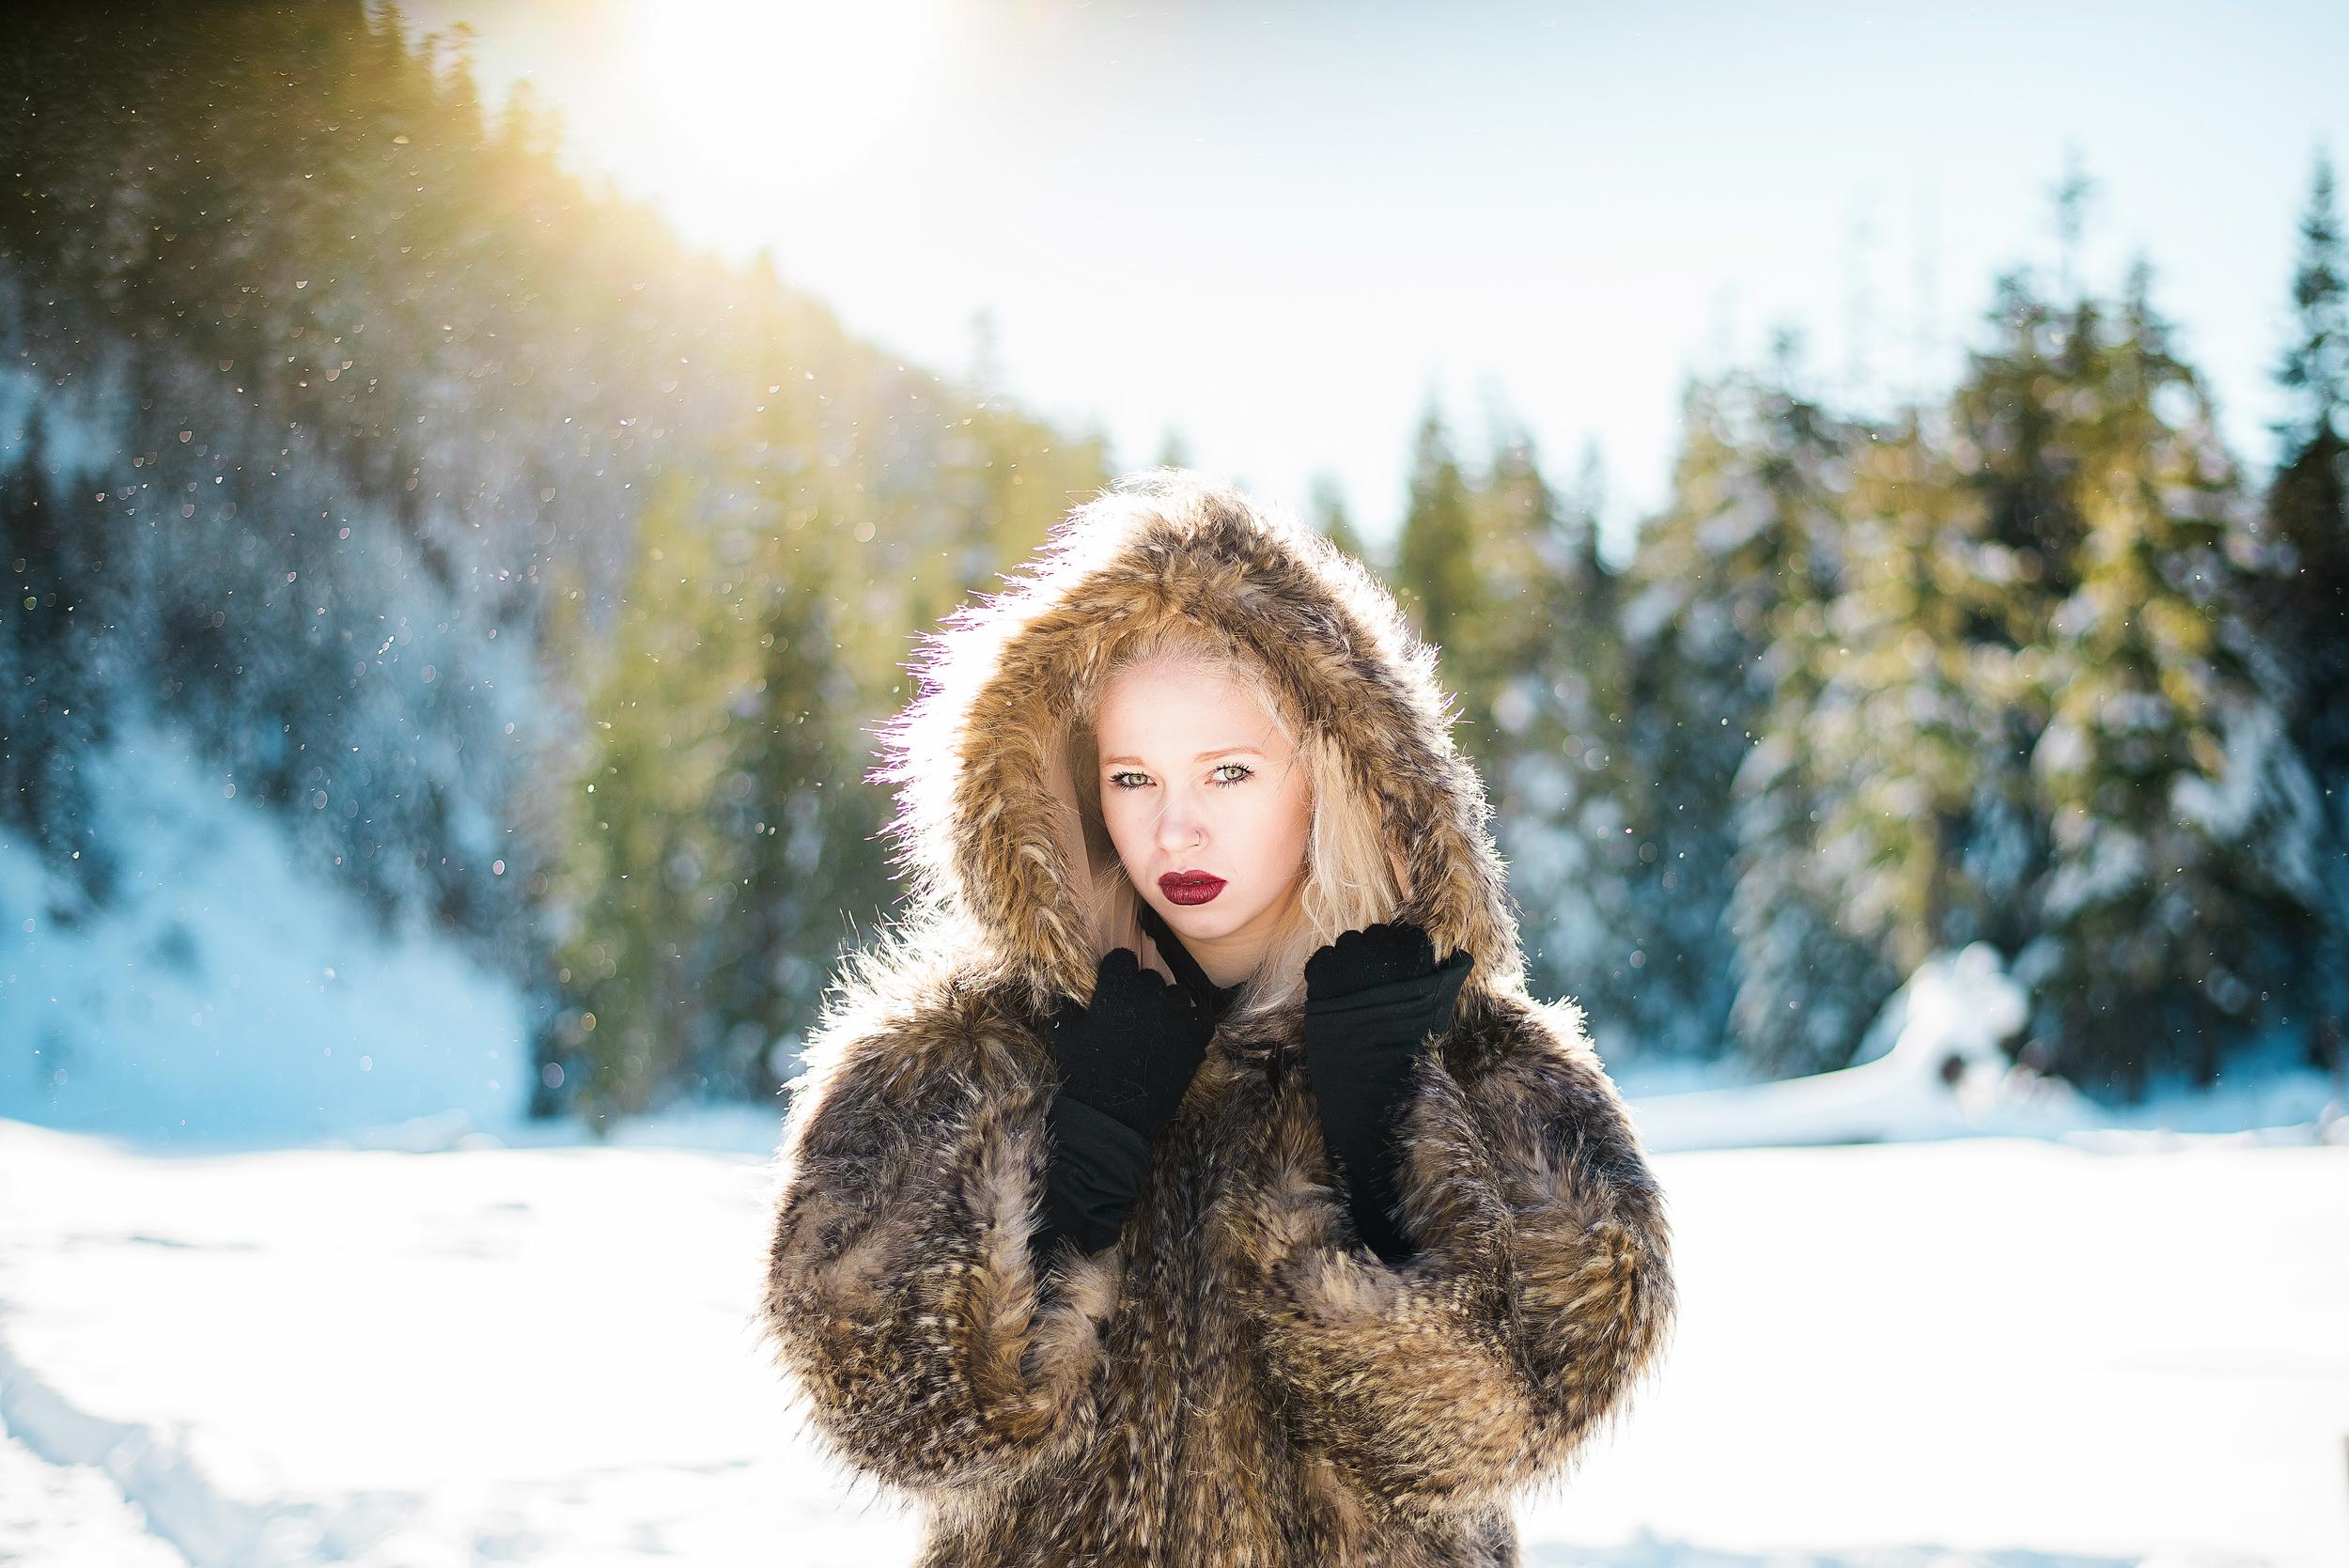 Winter Shoot - Mt Rainier 2015 2015- Proofs-0214R.jpg